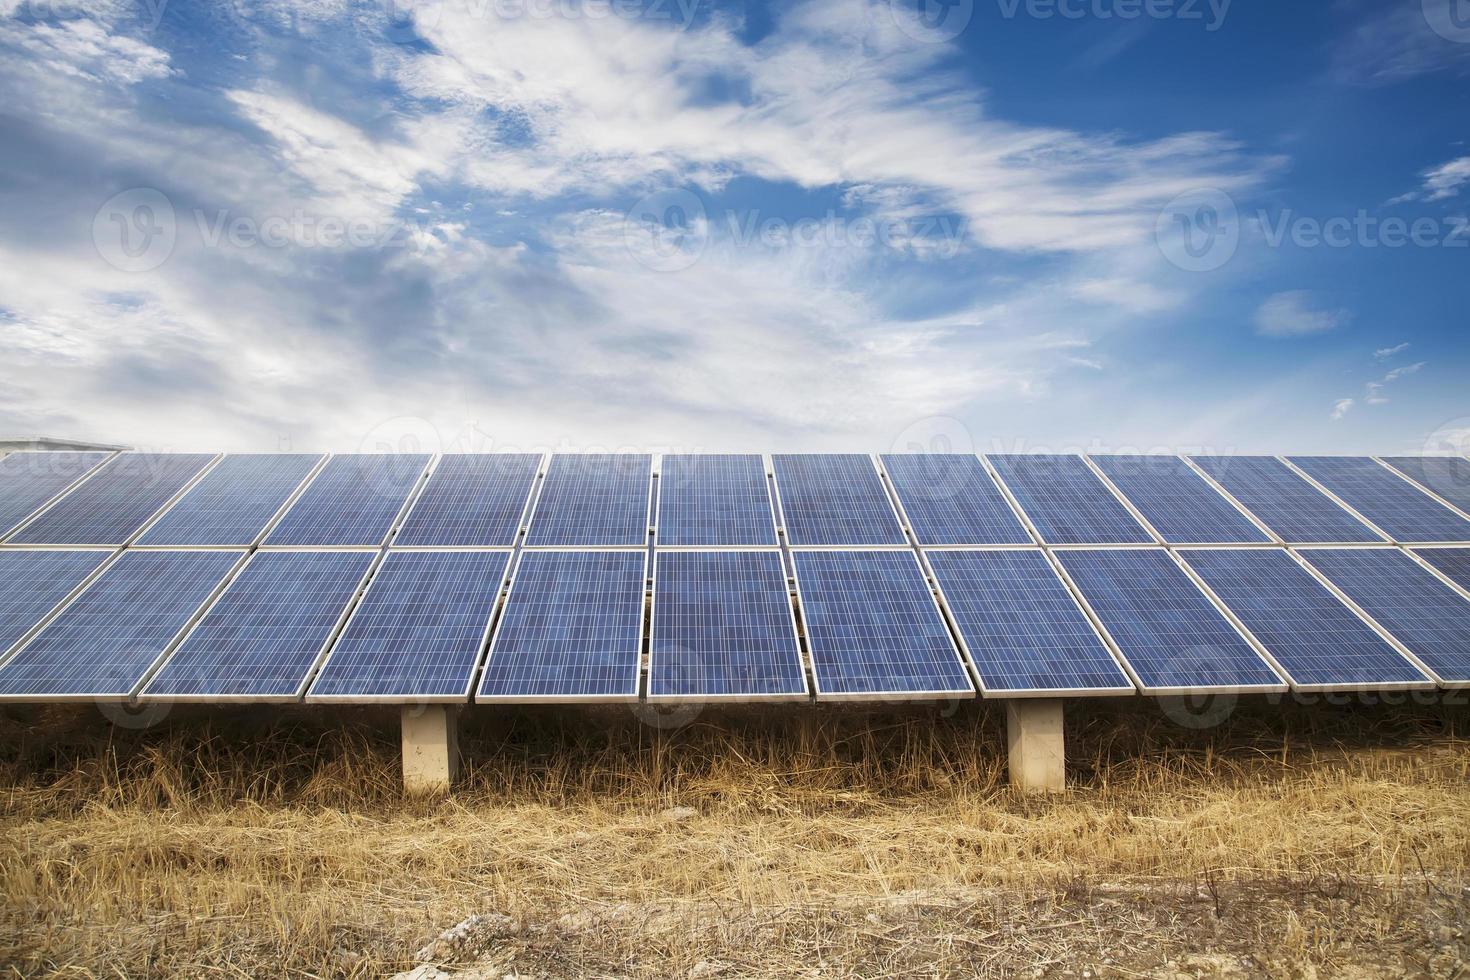 elektriciteitscentrale die gebruik maakt van hernieuwbare zonne-energie met zon foto